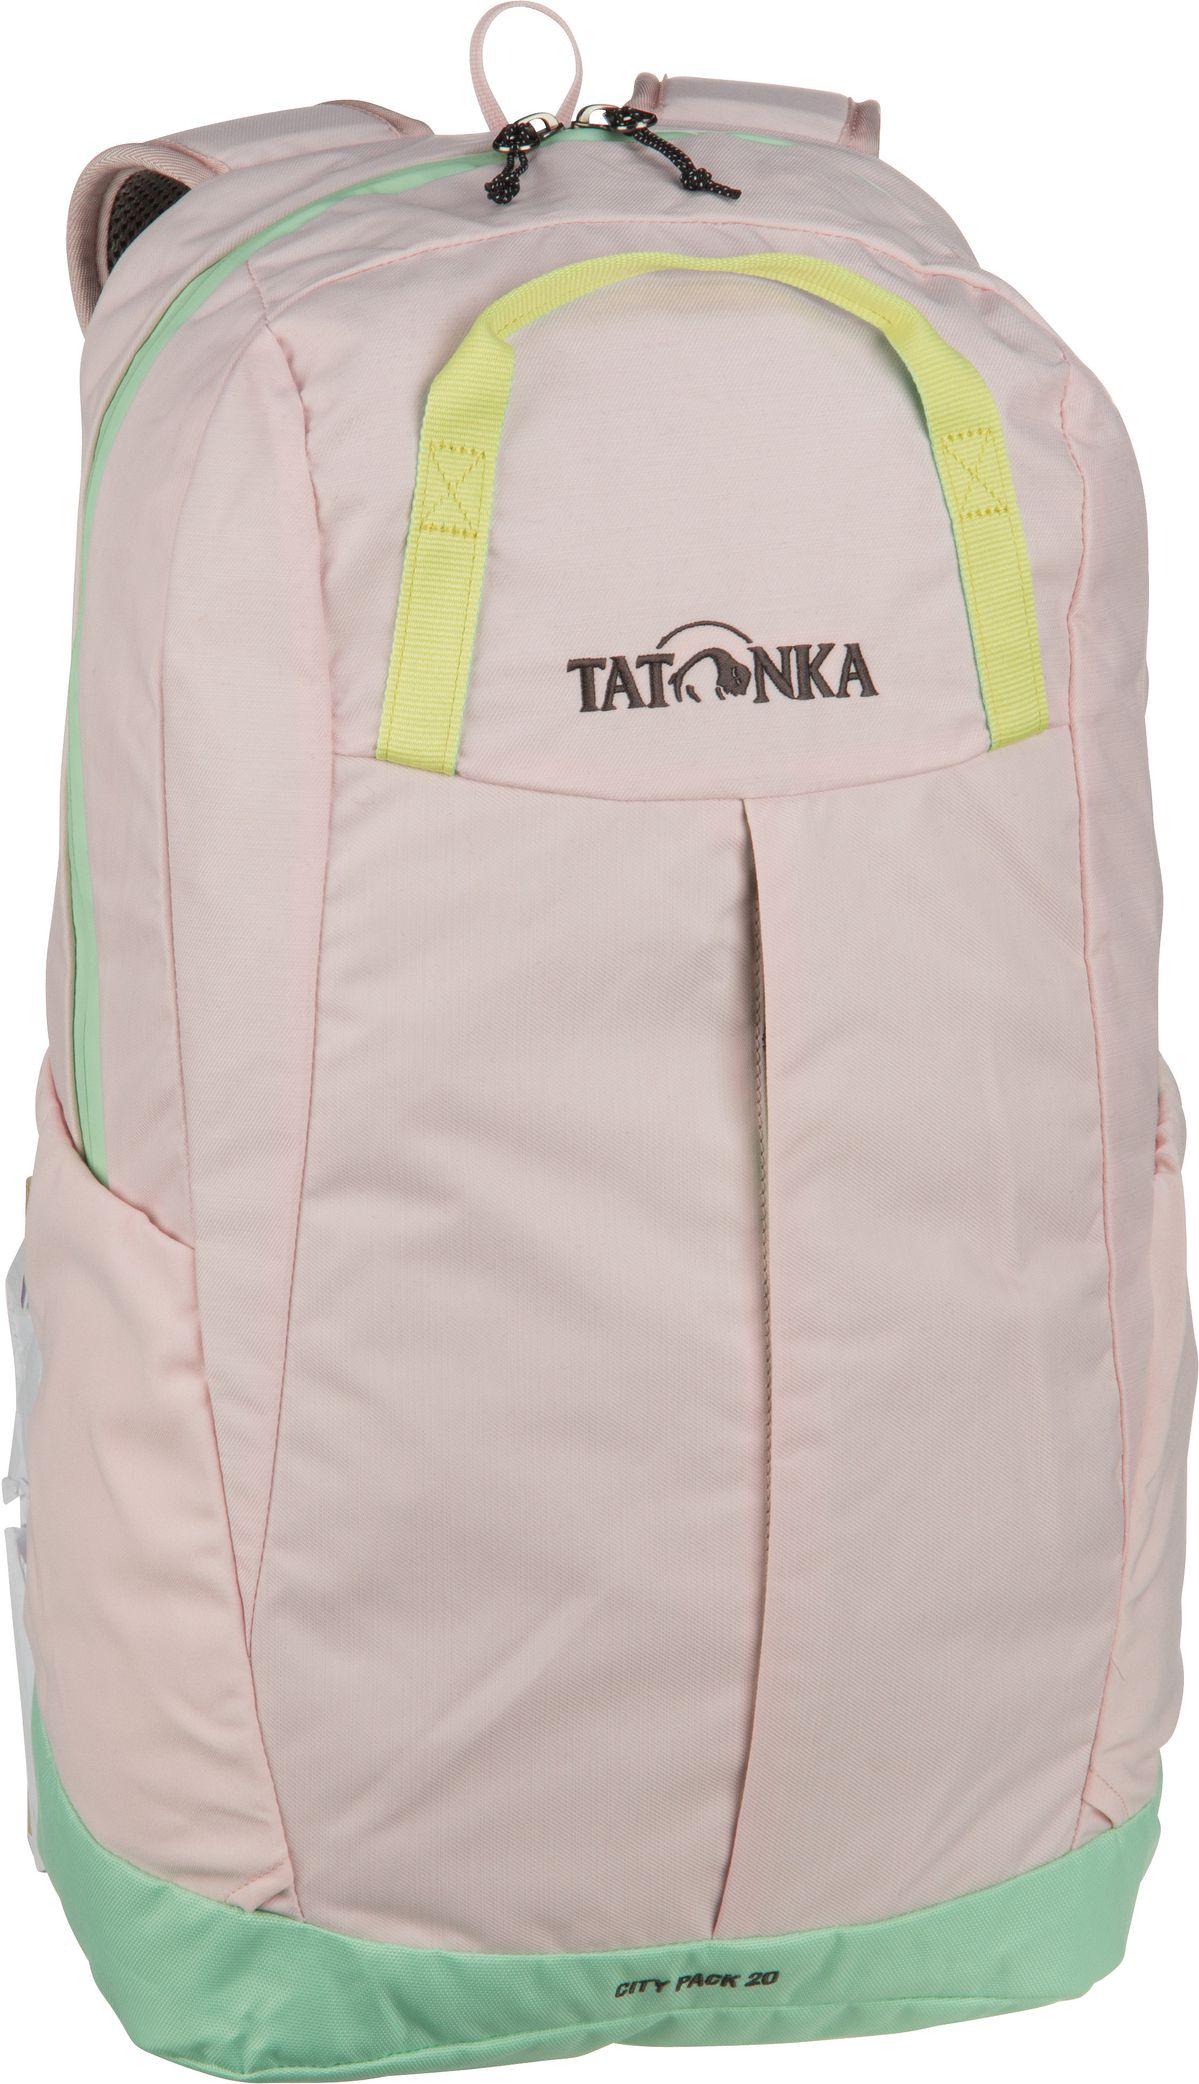 Rucksack / Daypack City Pack 20 Pink (20 Liter)